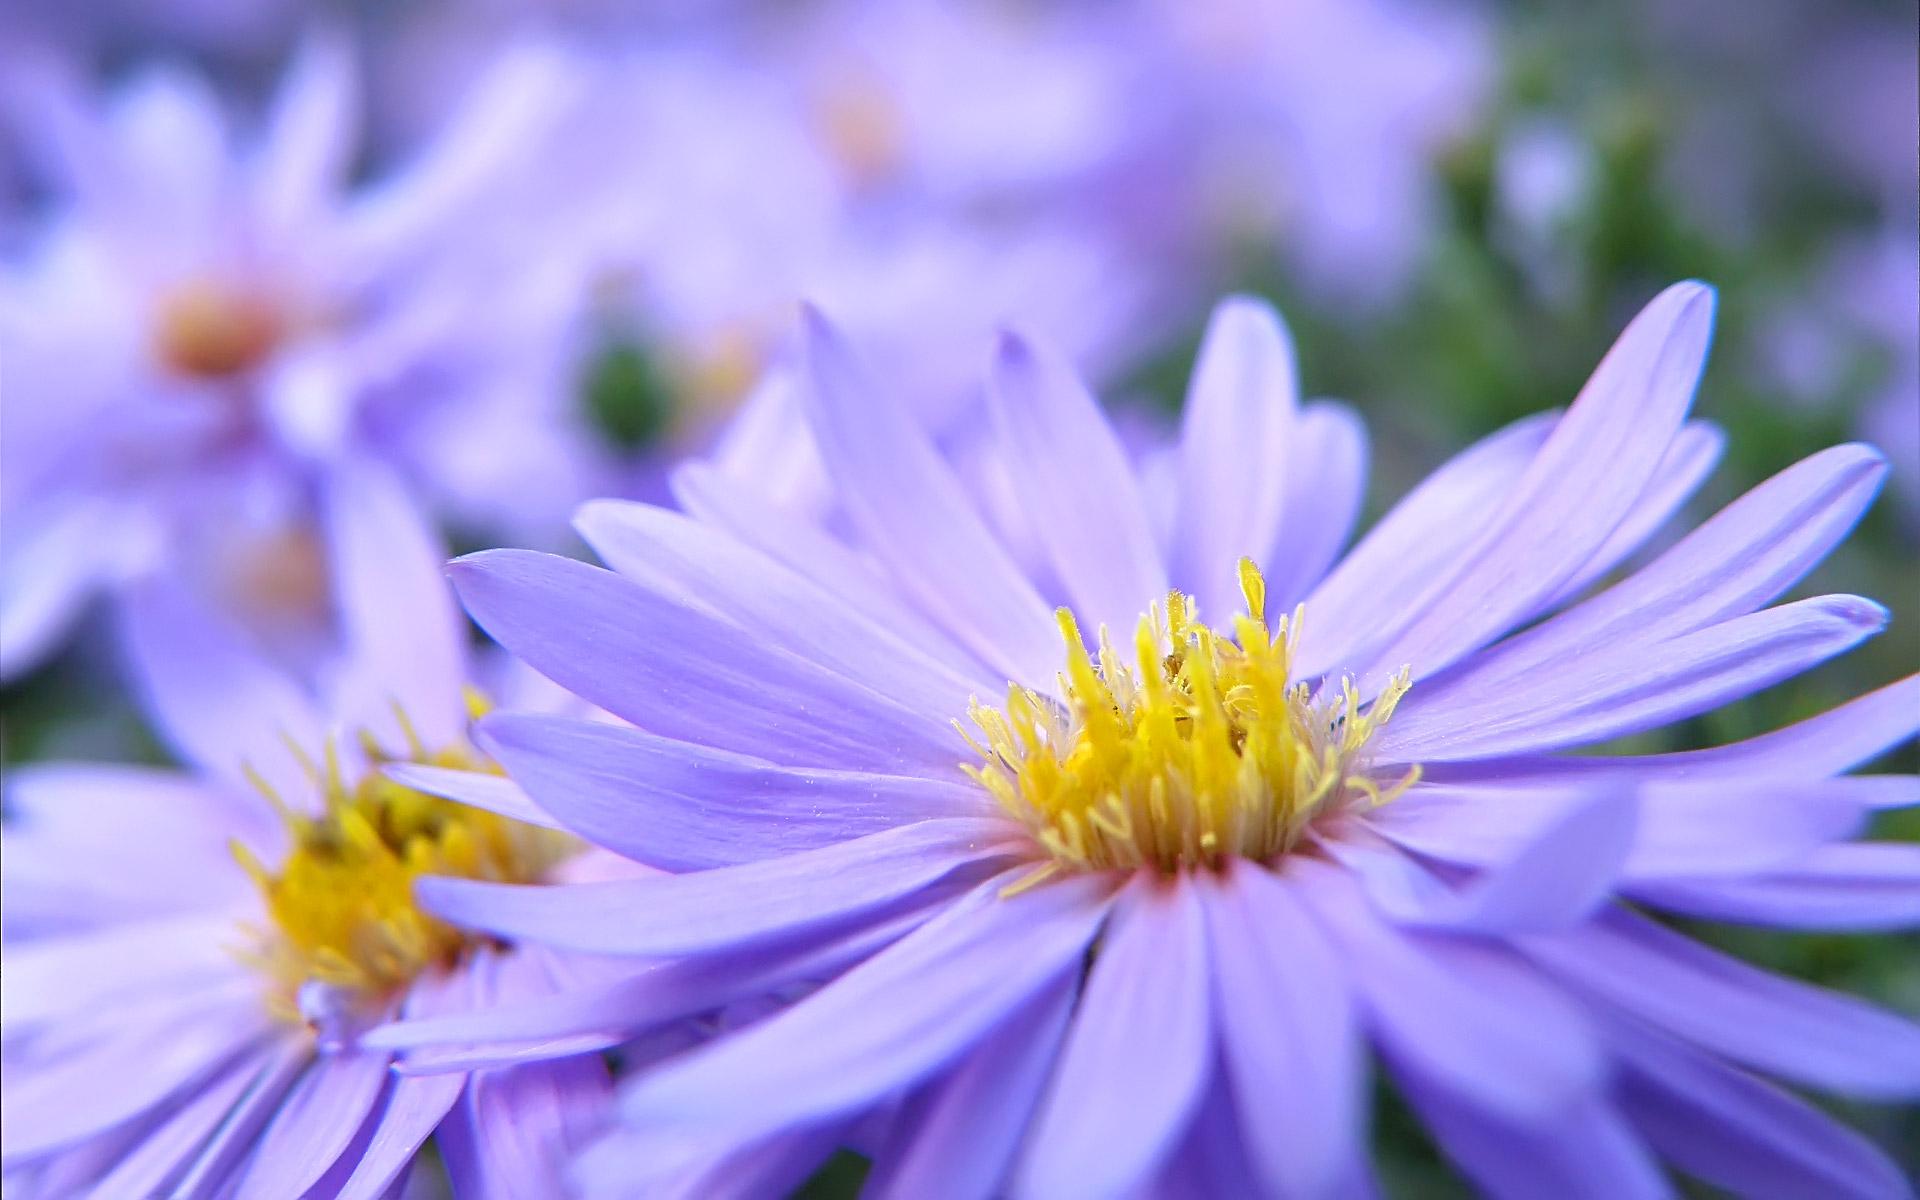 Pretty Violett Flowers Wallpapers HD Wallpapers 1920x1200